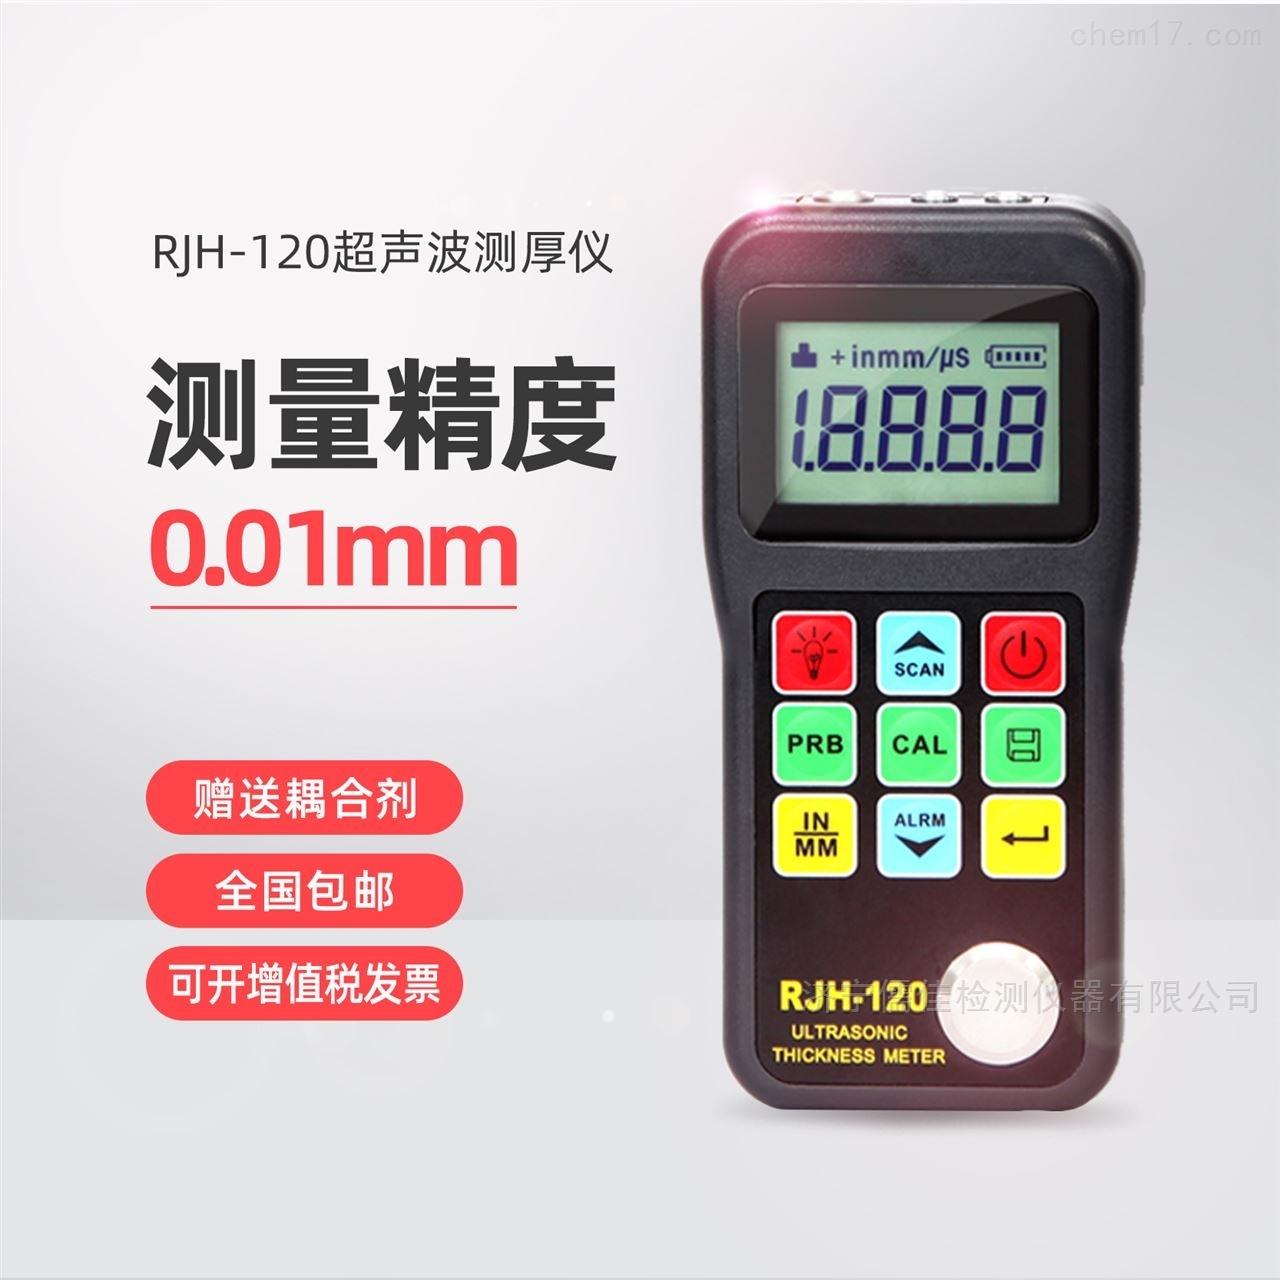 RJH-120玻璃纤维超声波测厚仪无损检测厂家